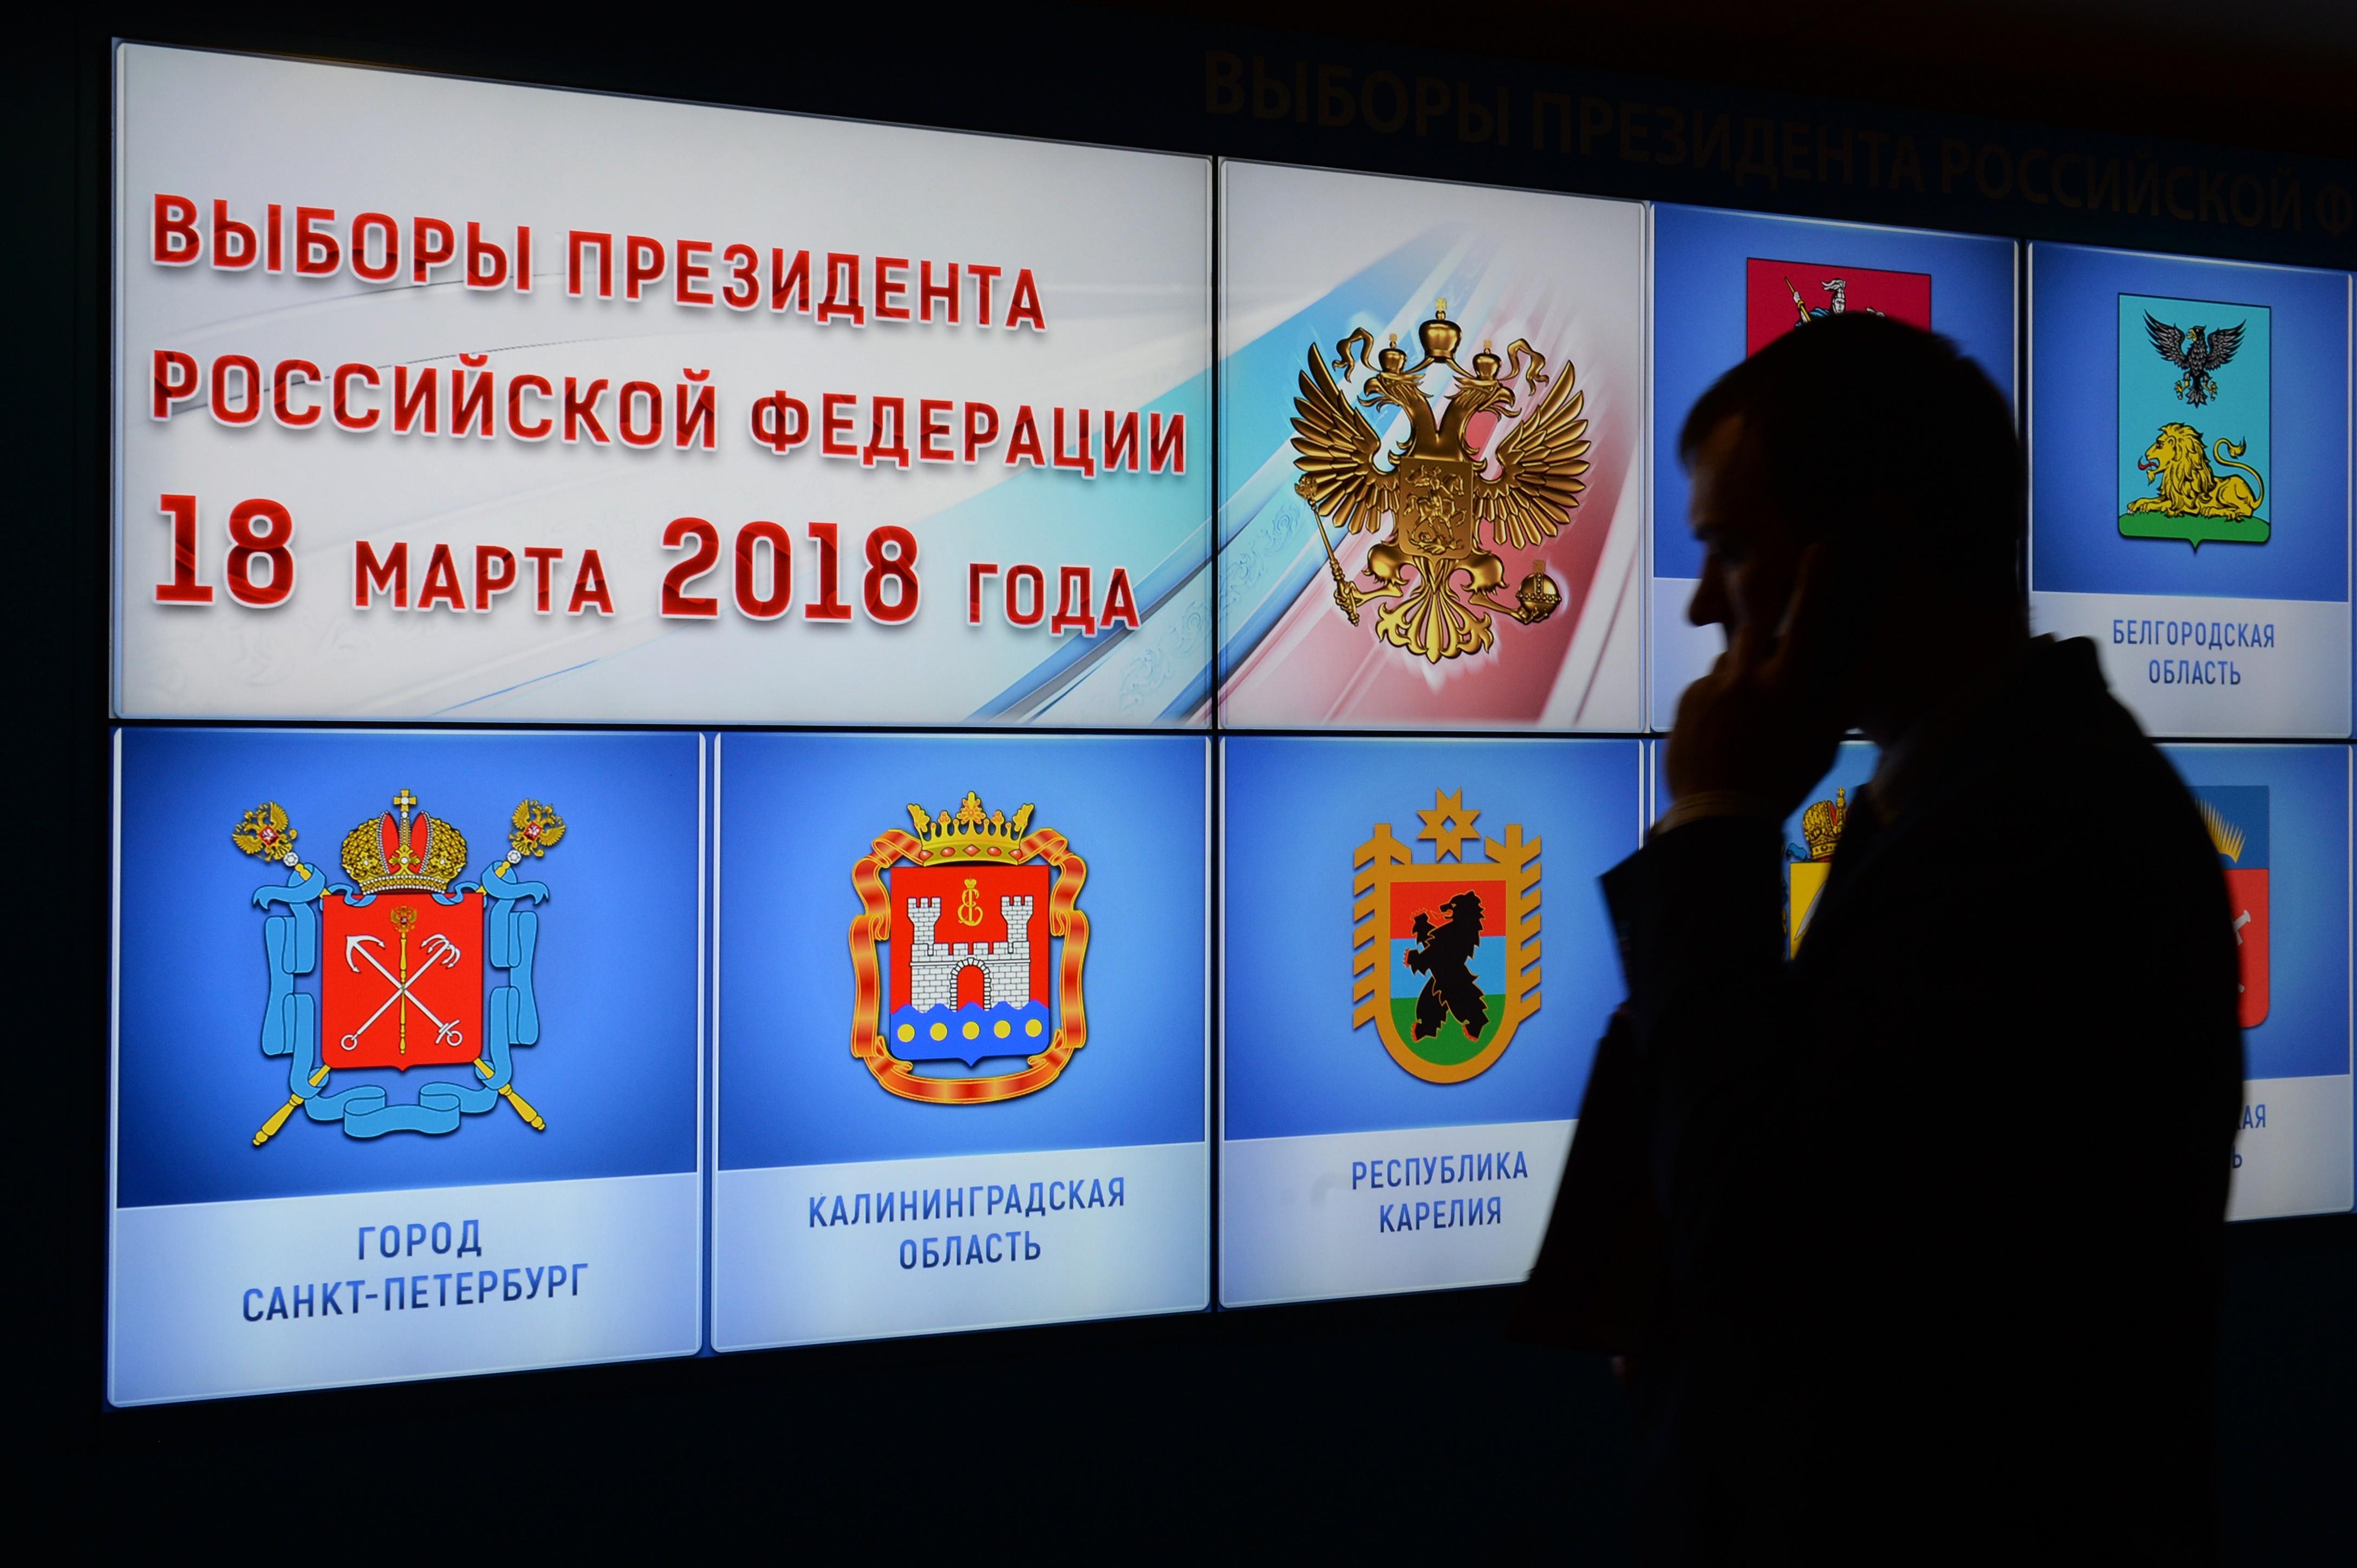 <p>Фото &copy; РИА Новости/Алексей Филиппов</p>